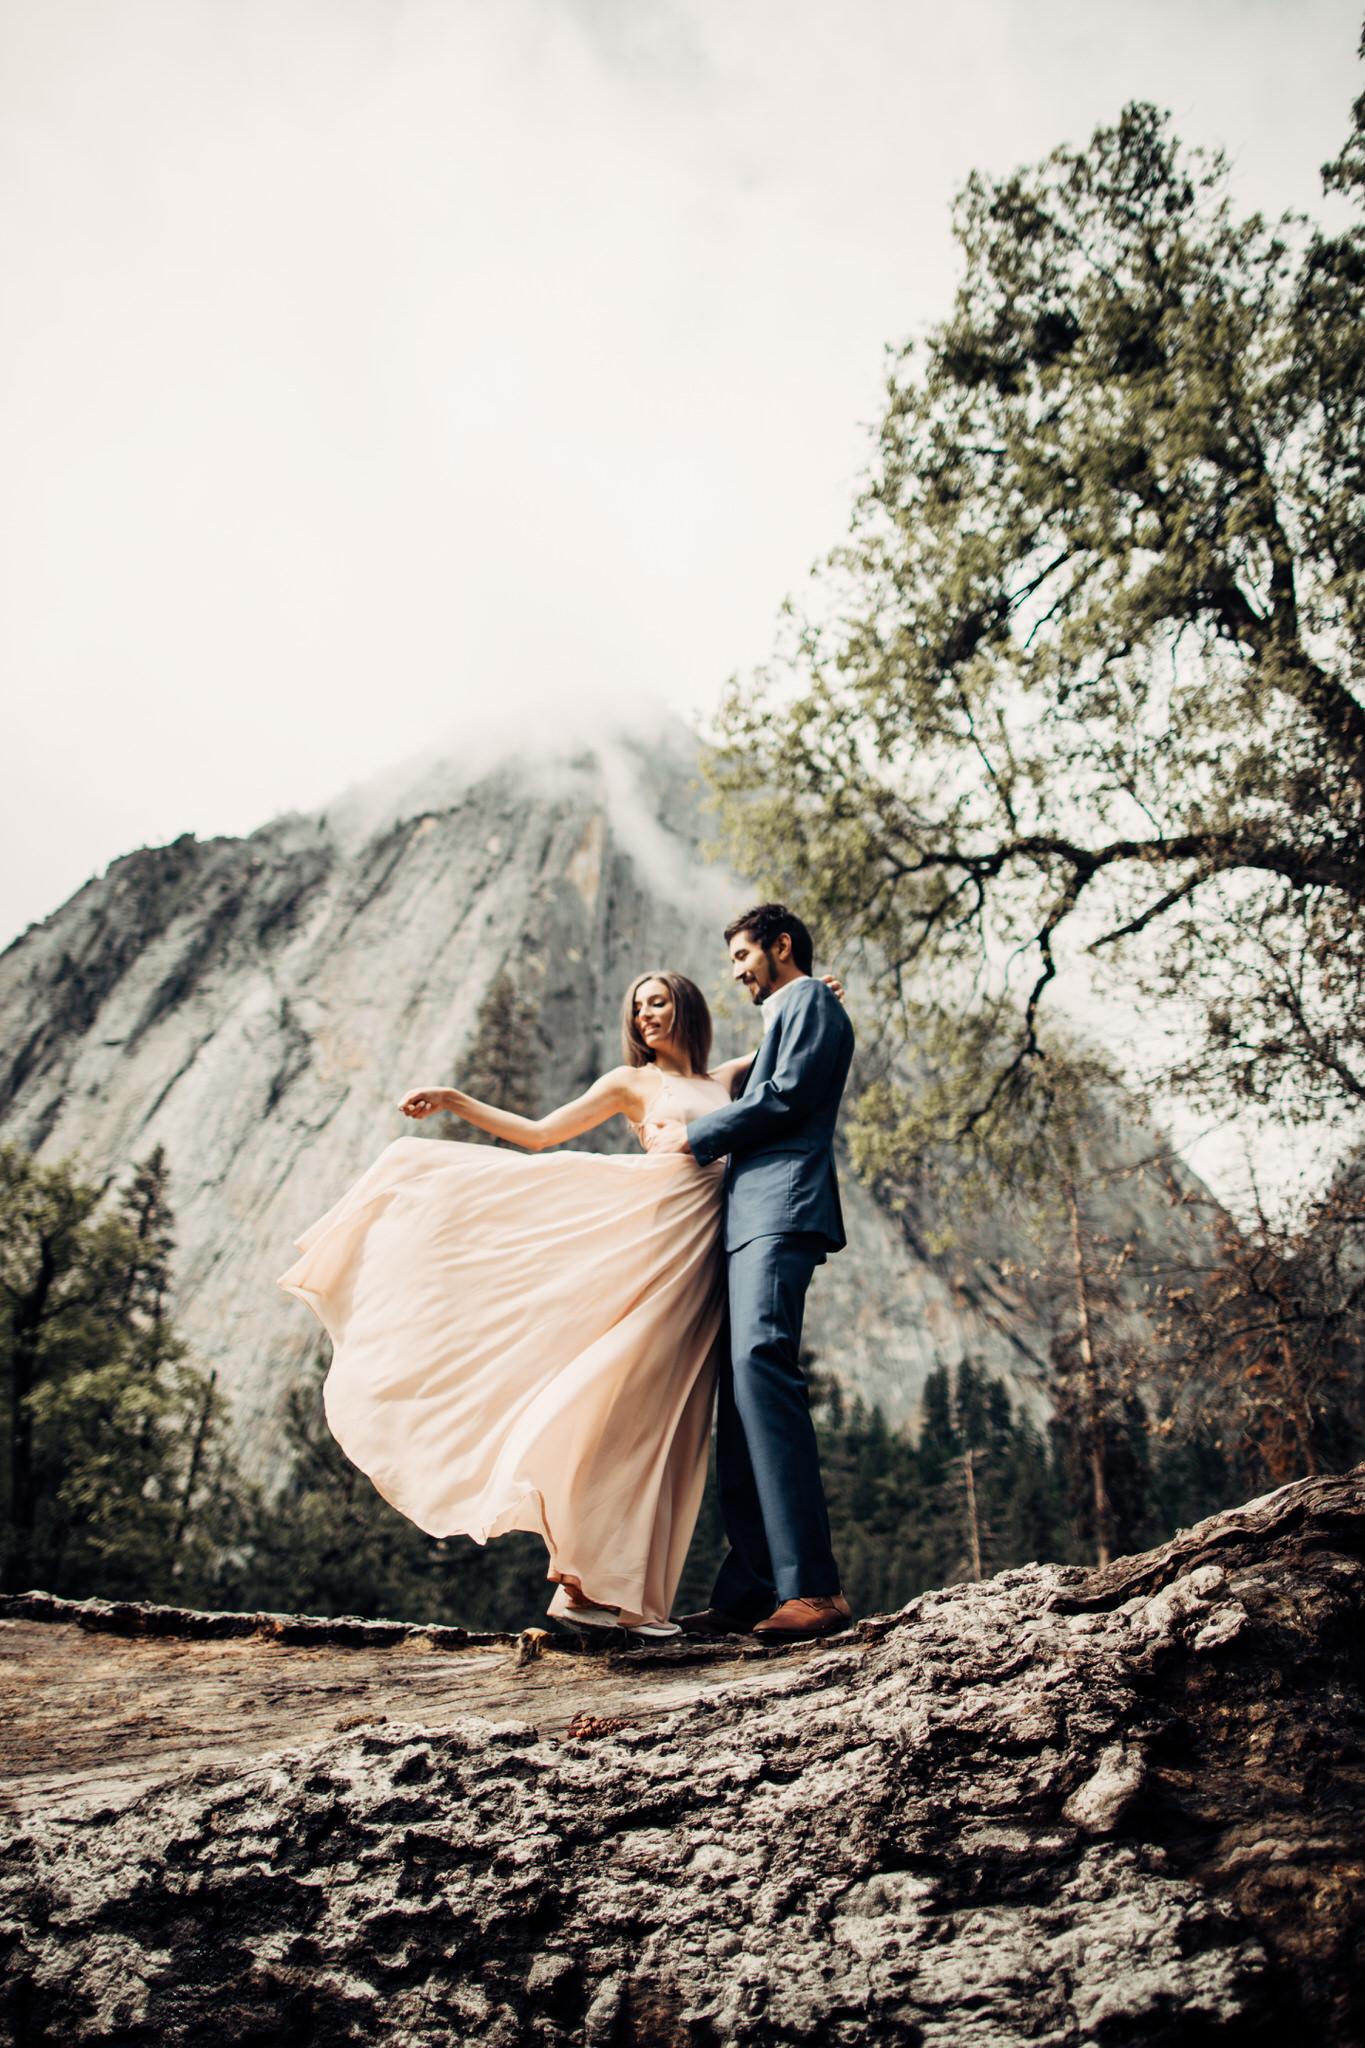 Yosemite-engagement-session-lauren-and-tom77.jpg